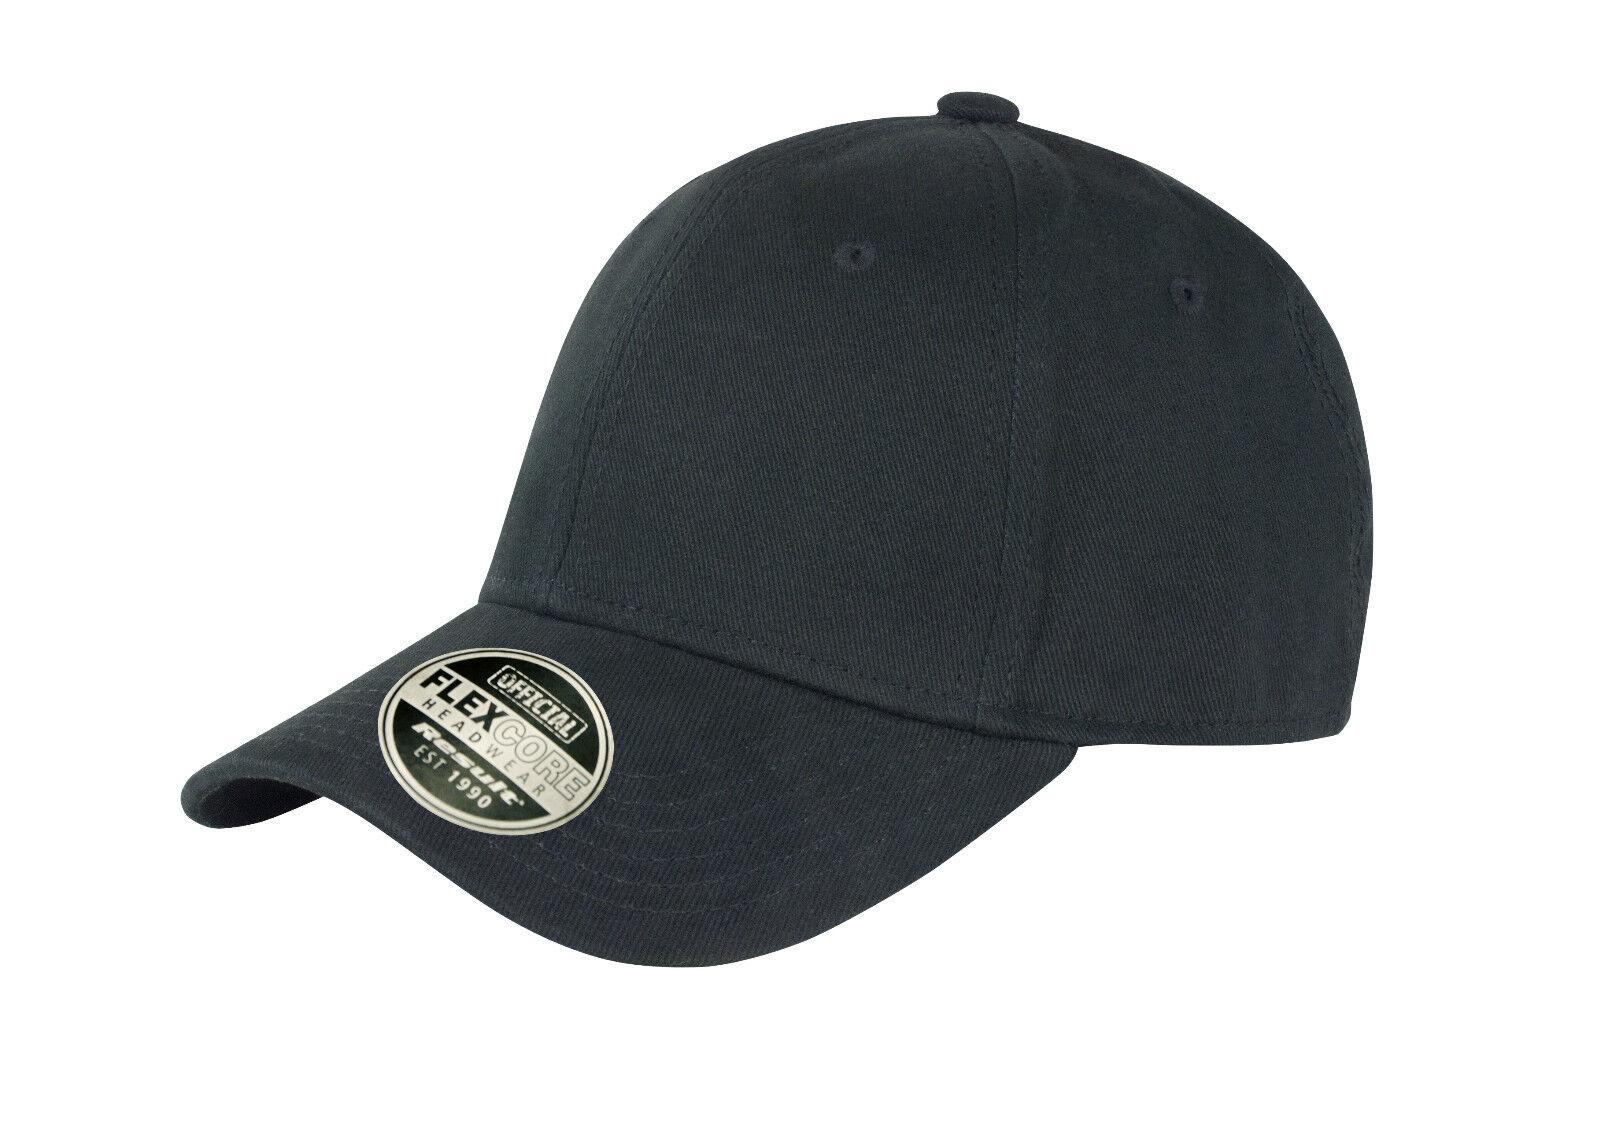 f55e8c140feca New Unisex Plain Black Flexible Fit Flex Core Cotton Fitted Baseball ...